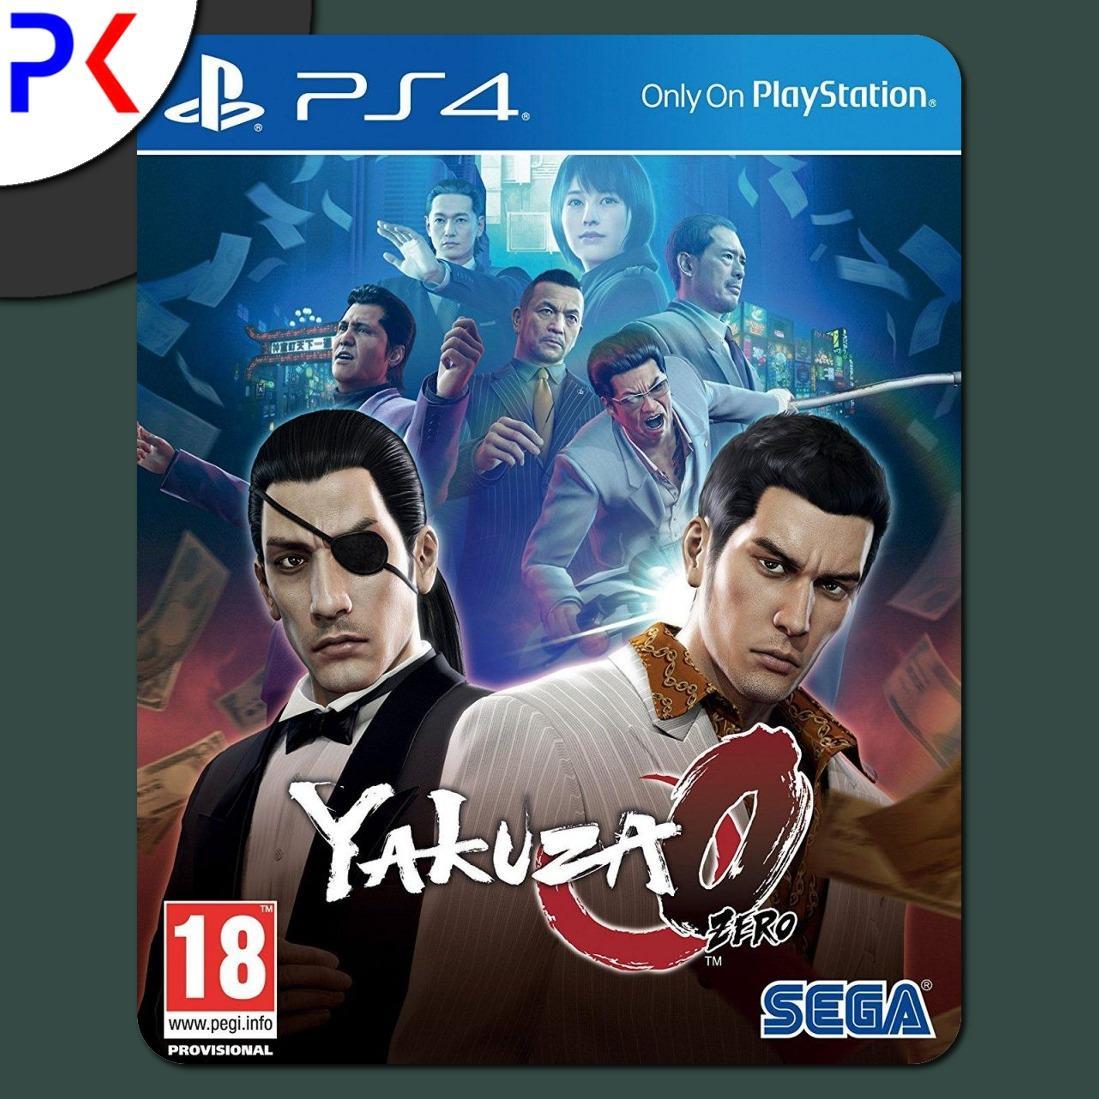 Price Comparisons Of Ps4 Yakuza R1